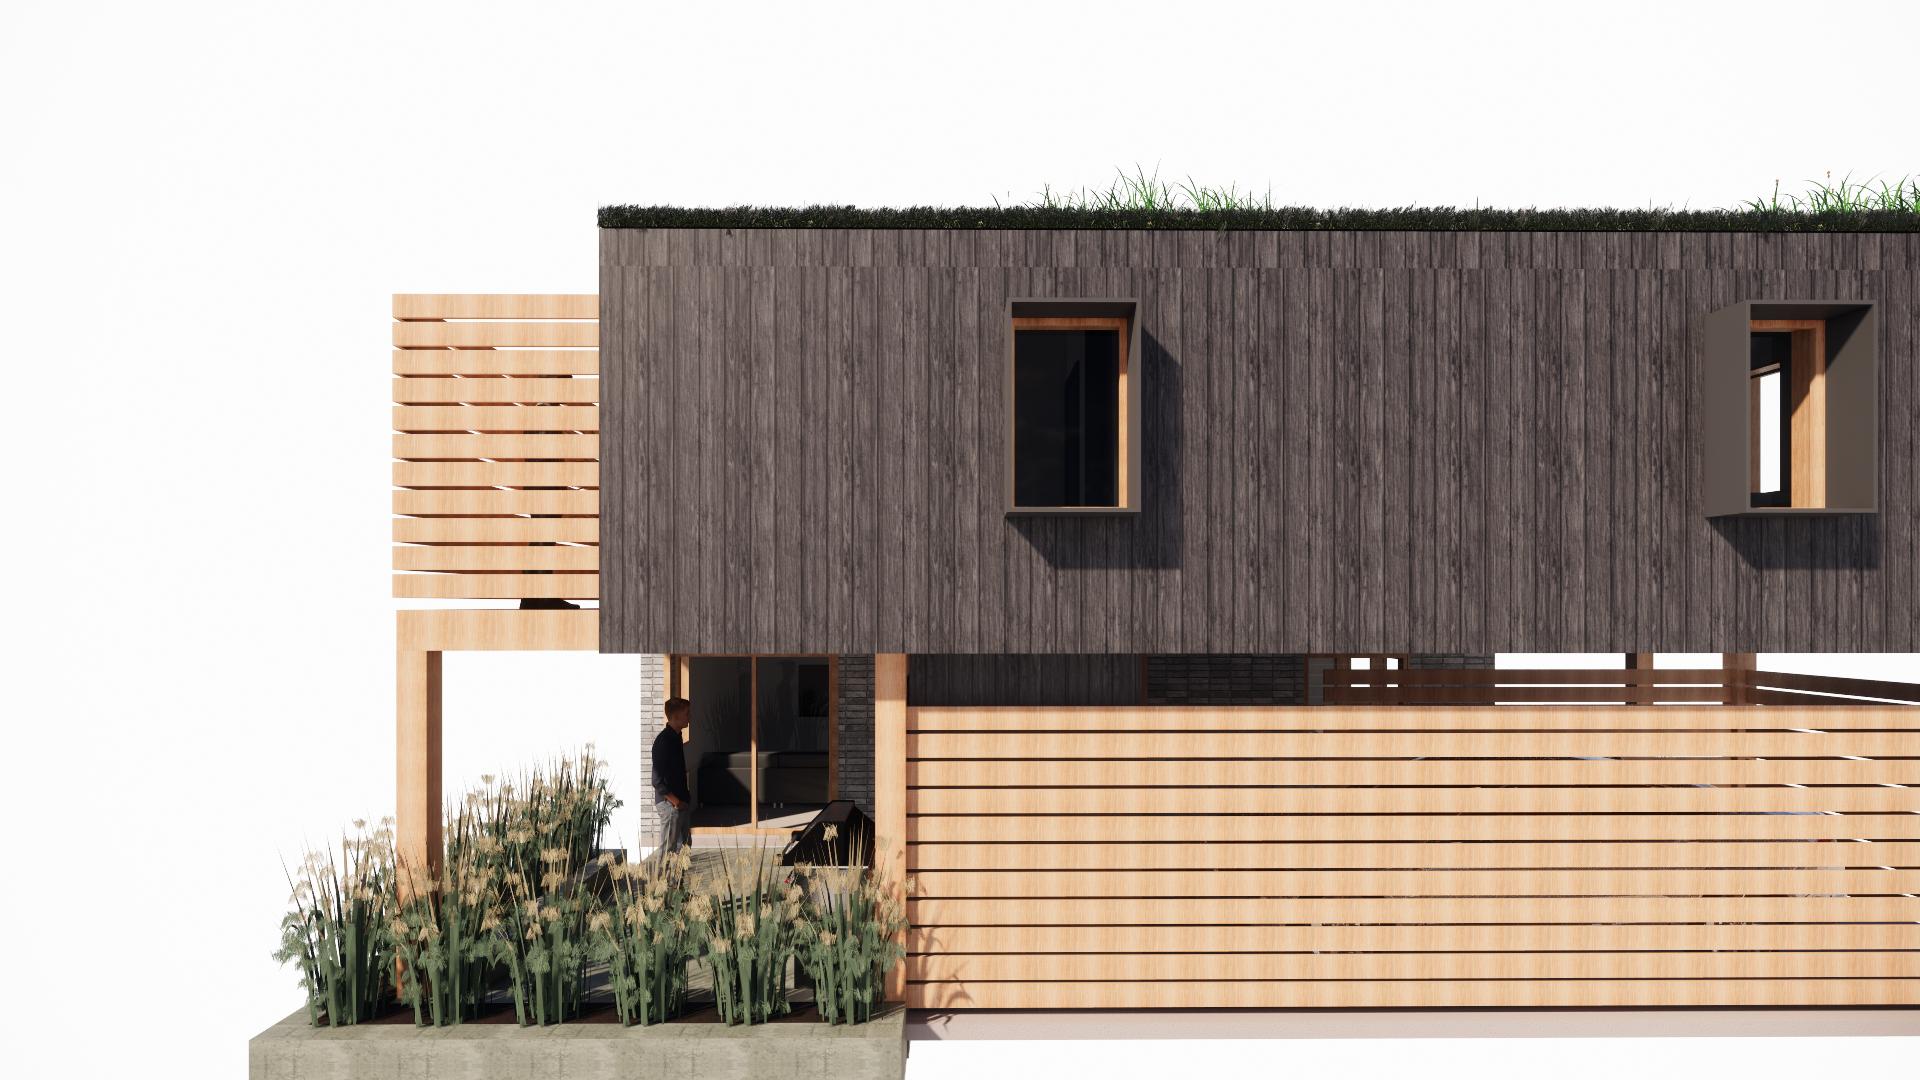 haywooddesign